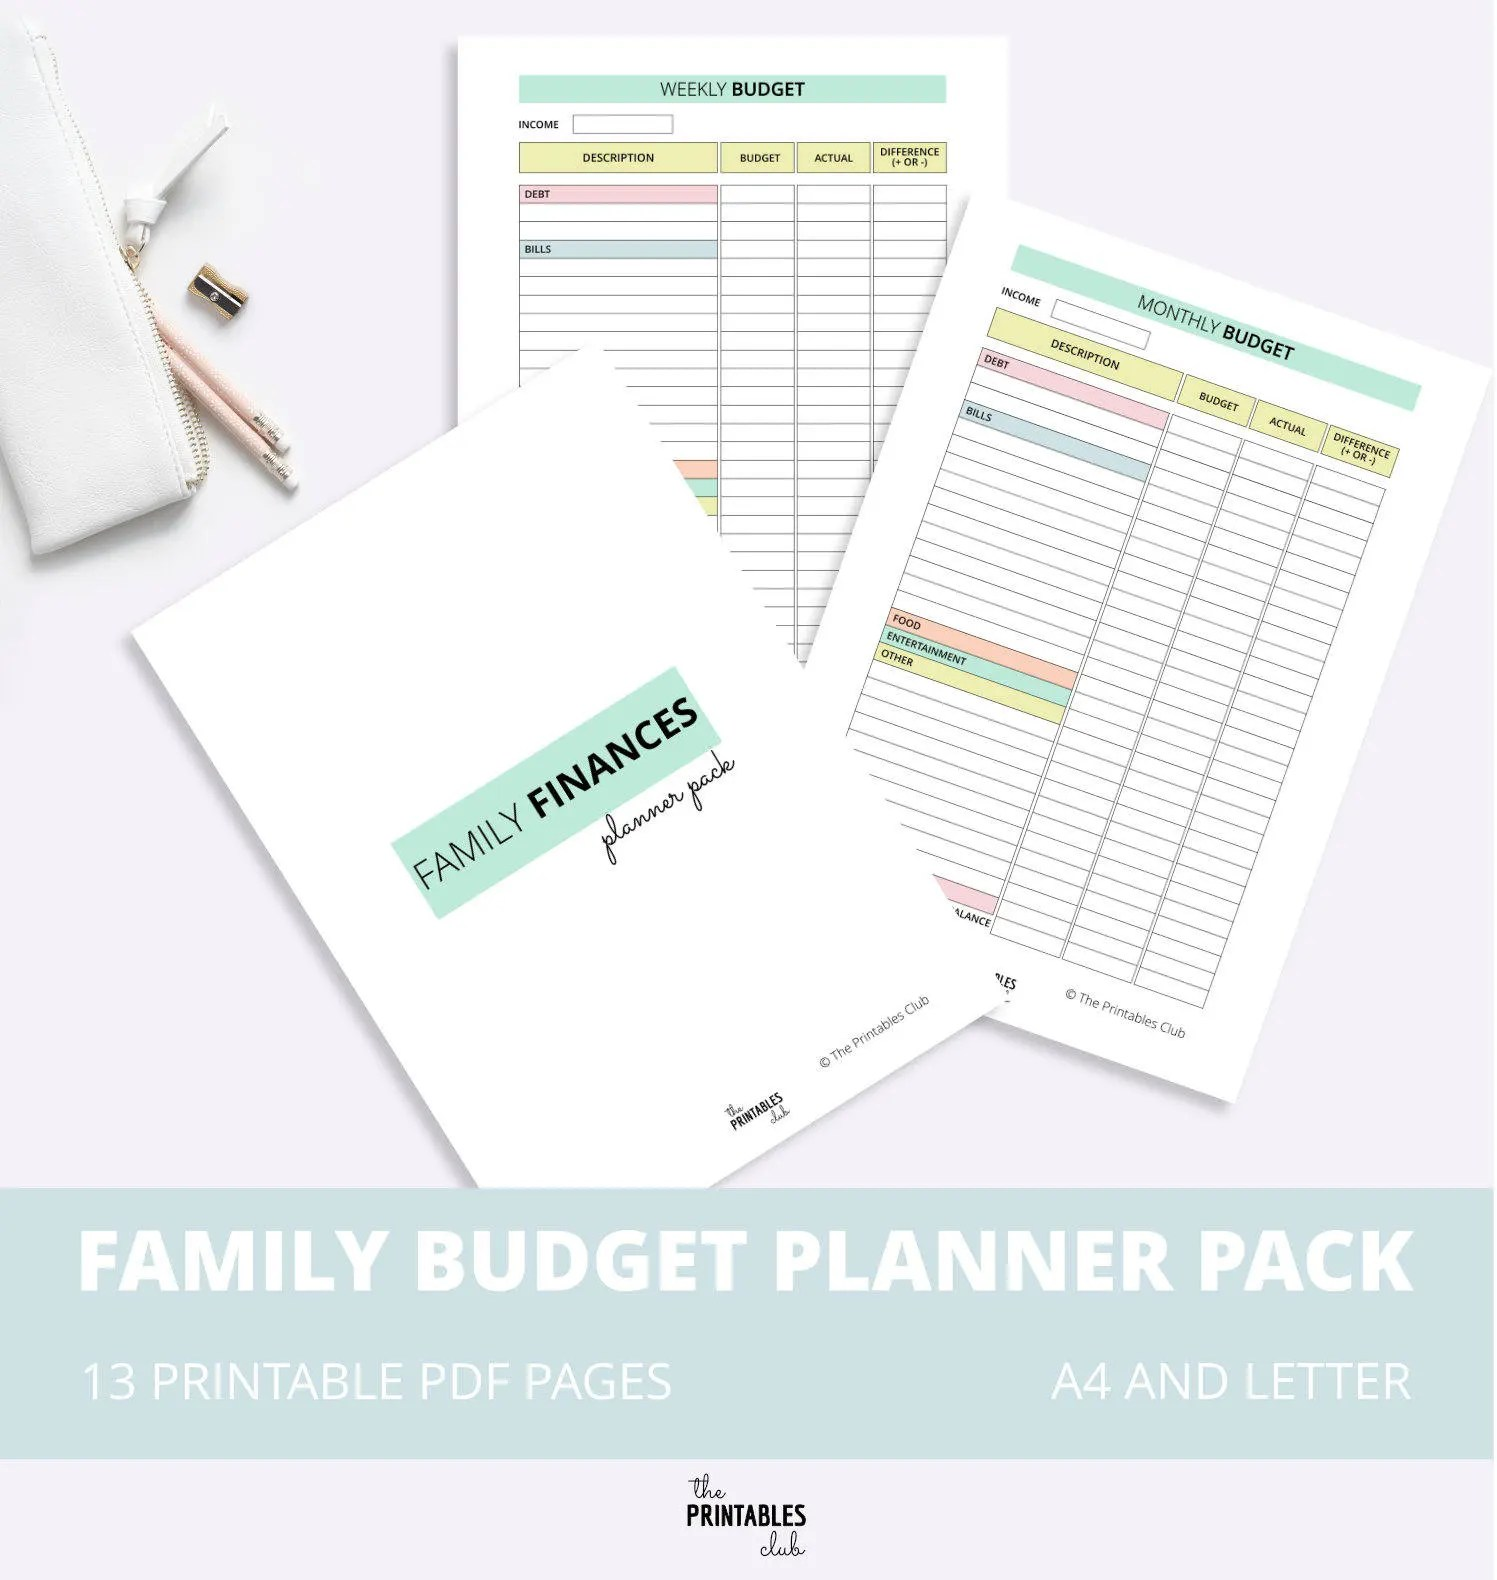 Family Budget Printable Pack Budget Planner Family Finance